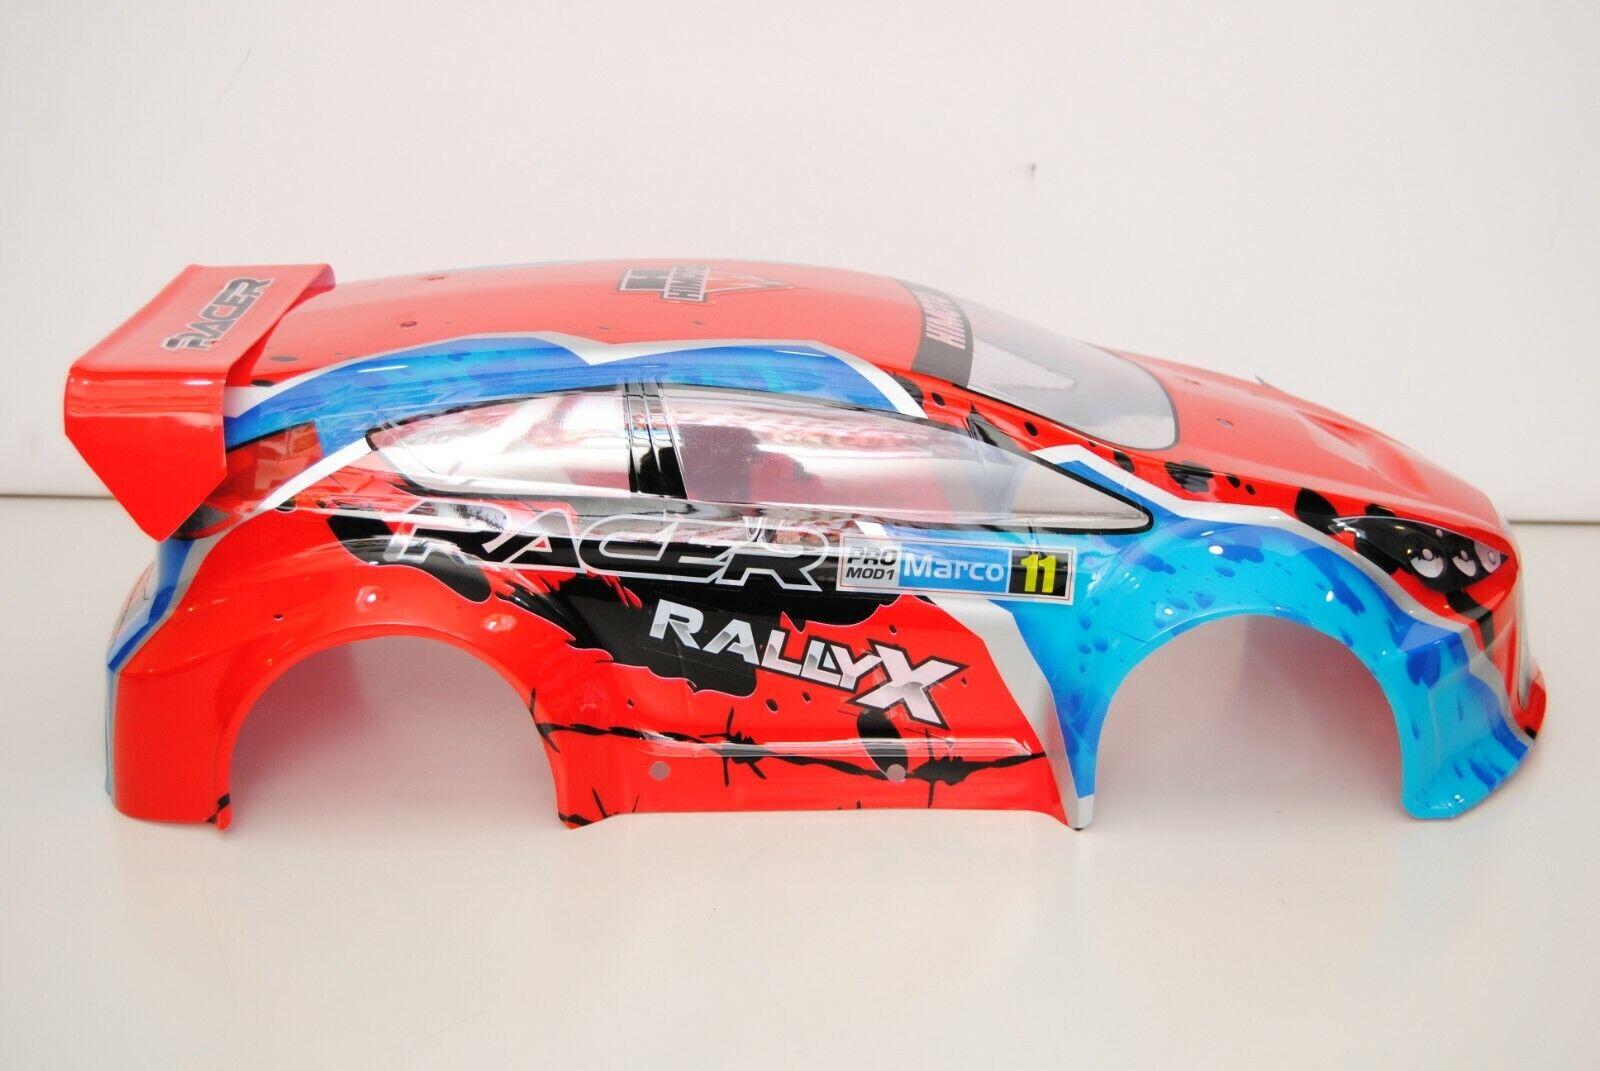 Bodywork Bodywork Bodywork Road Rally x 1 10 31920r Himoto Road f13015